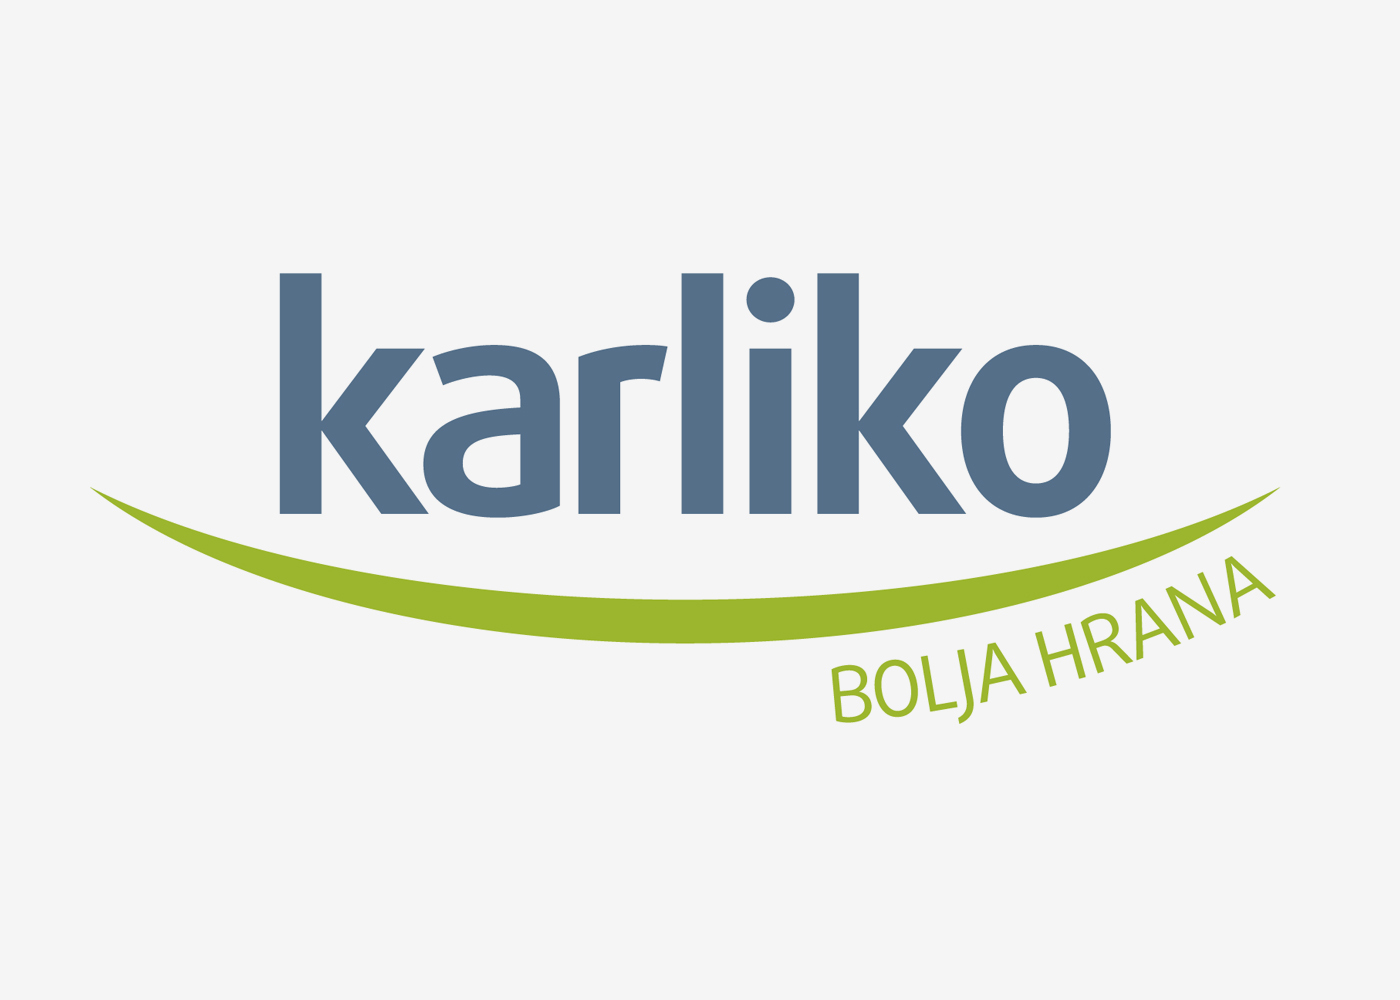 New visual identity - Karliko